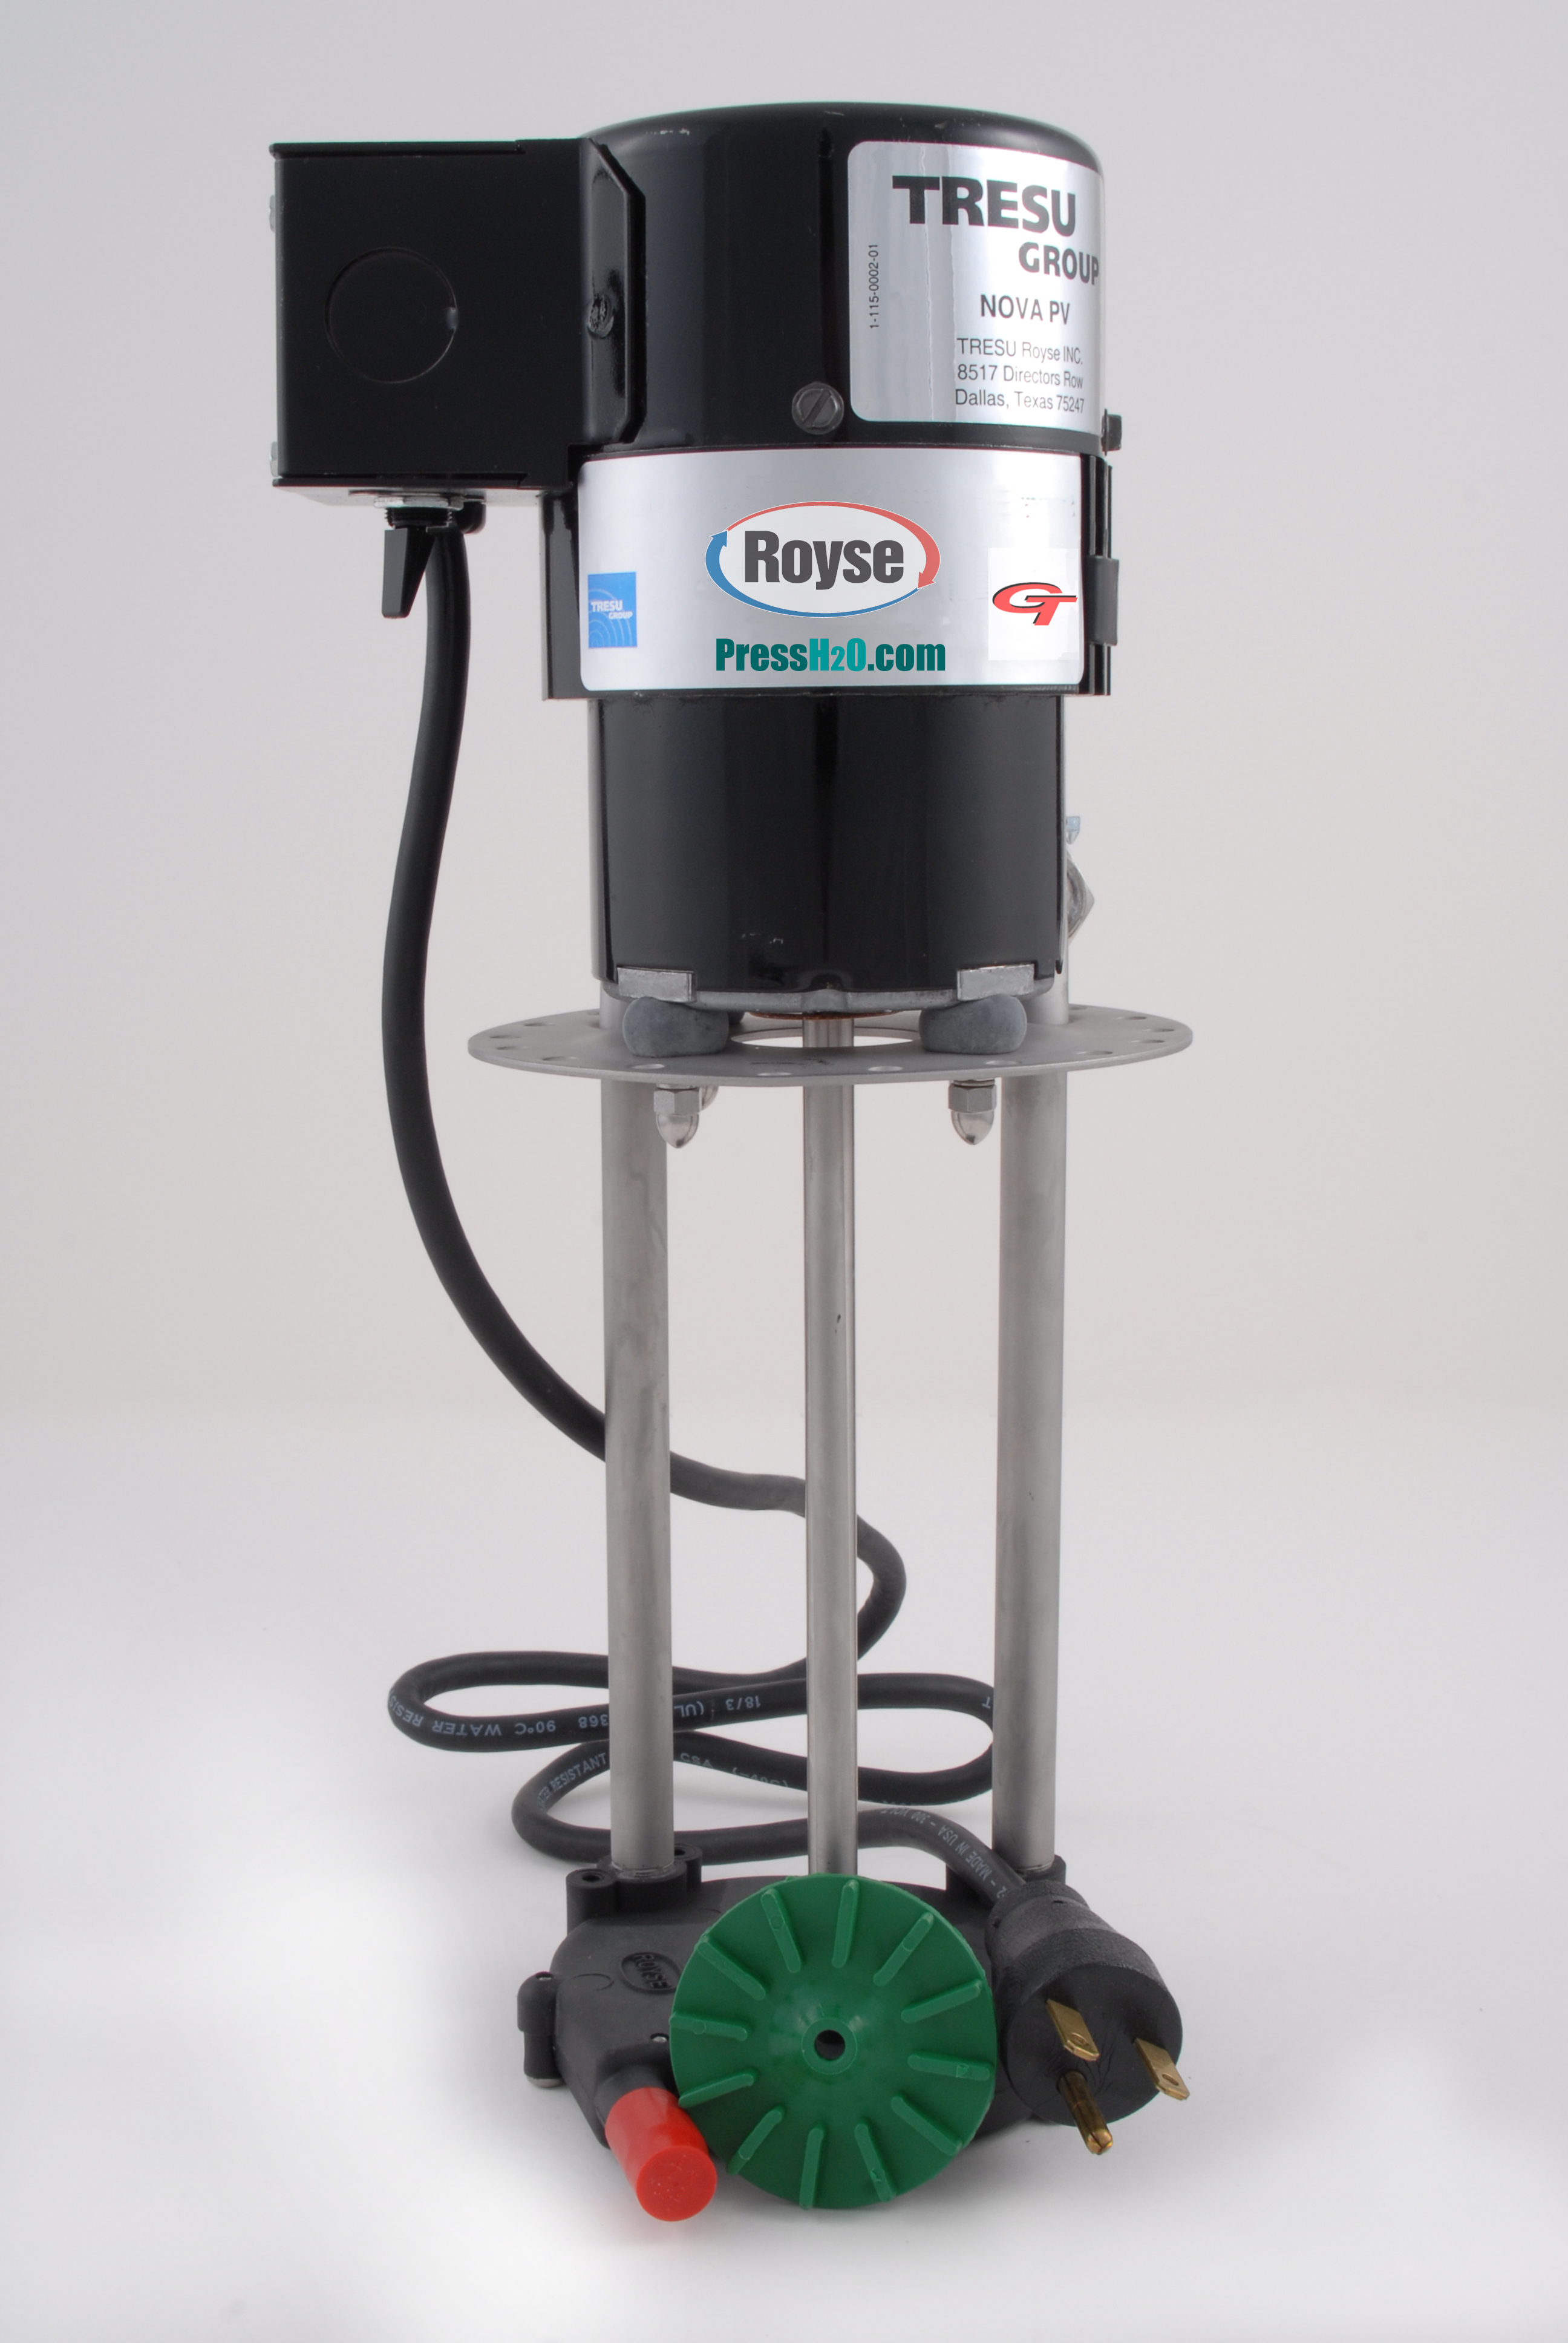 Royse Pump